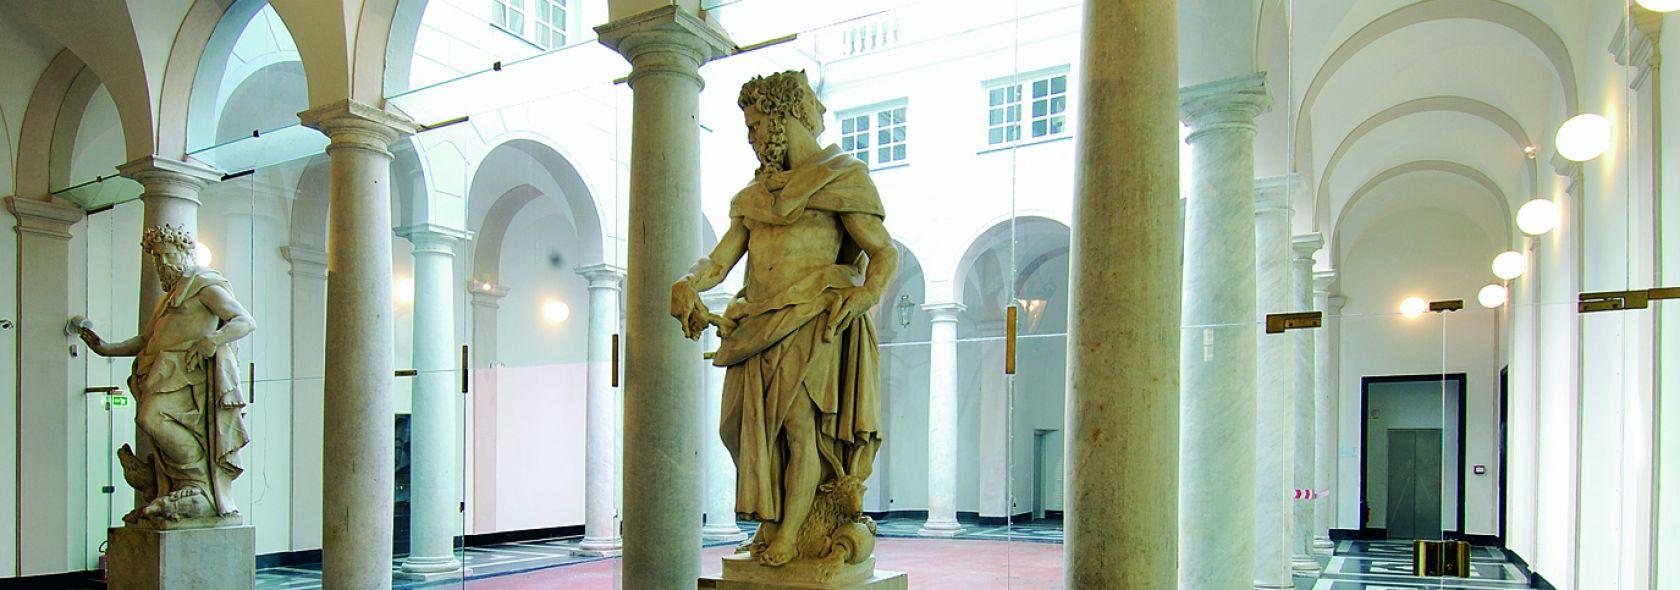 Palazzo Luca Grimaldi, Palazzo Bianco - atrio